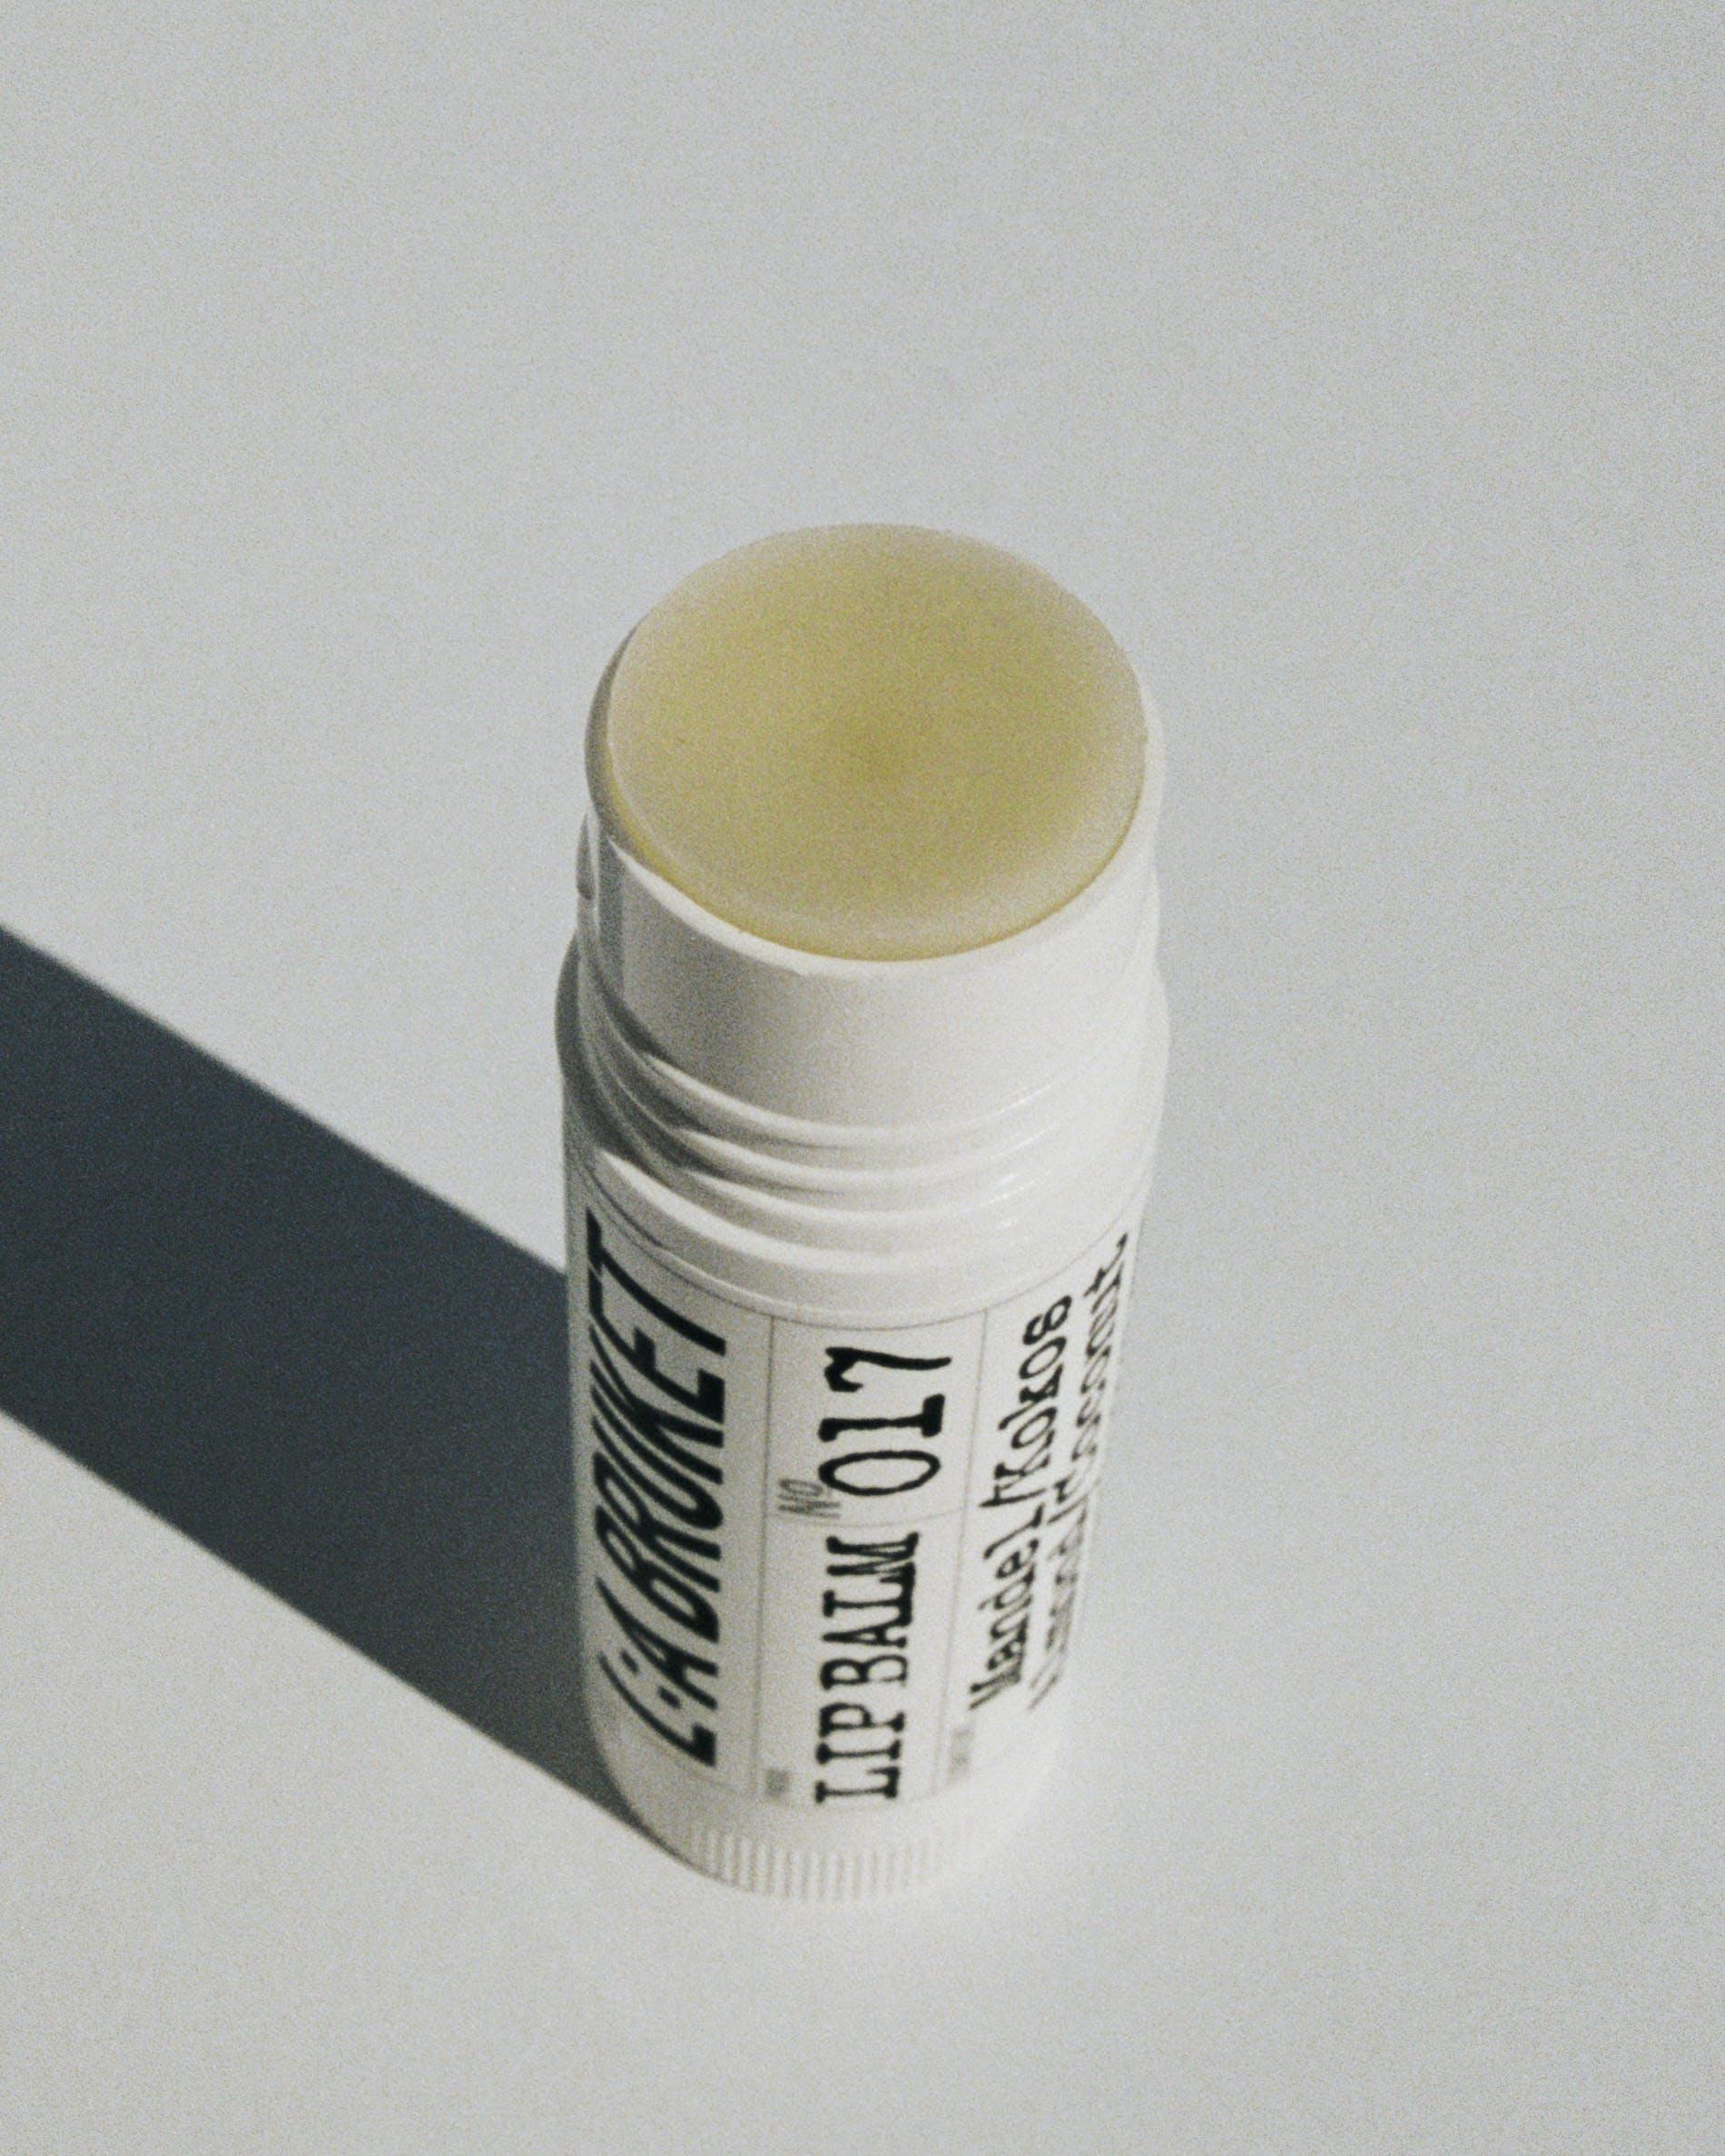 OhMart L:A Bruket 017 Lip Balm ( Almond / Coconut ) 2